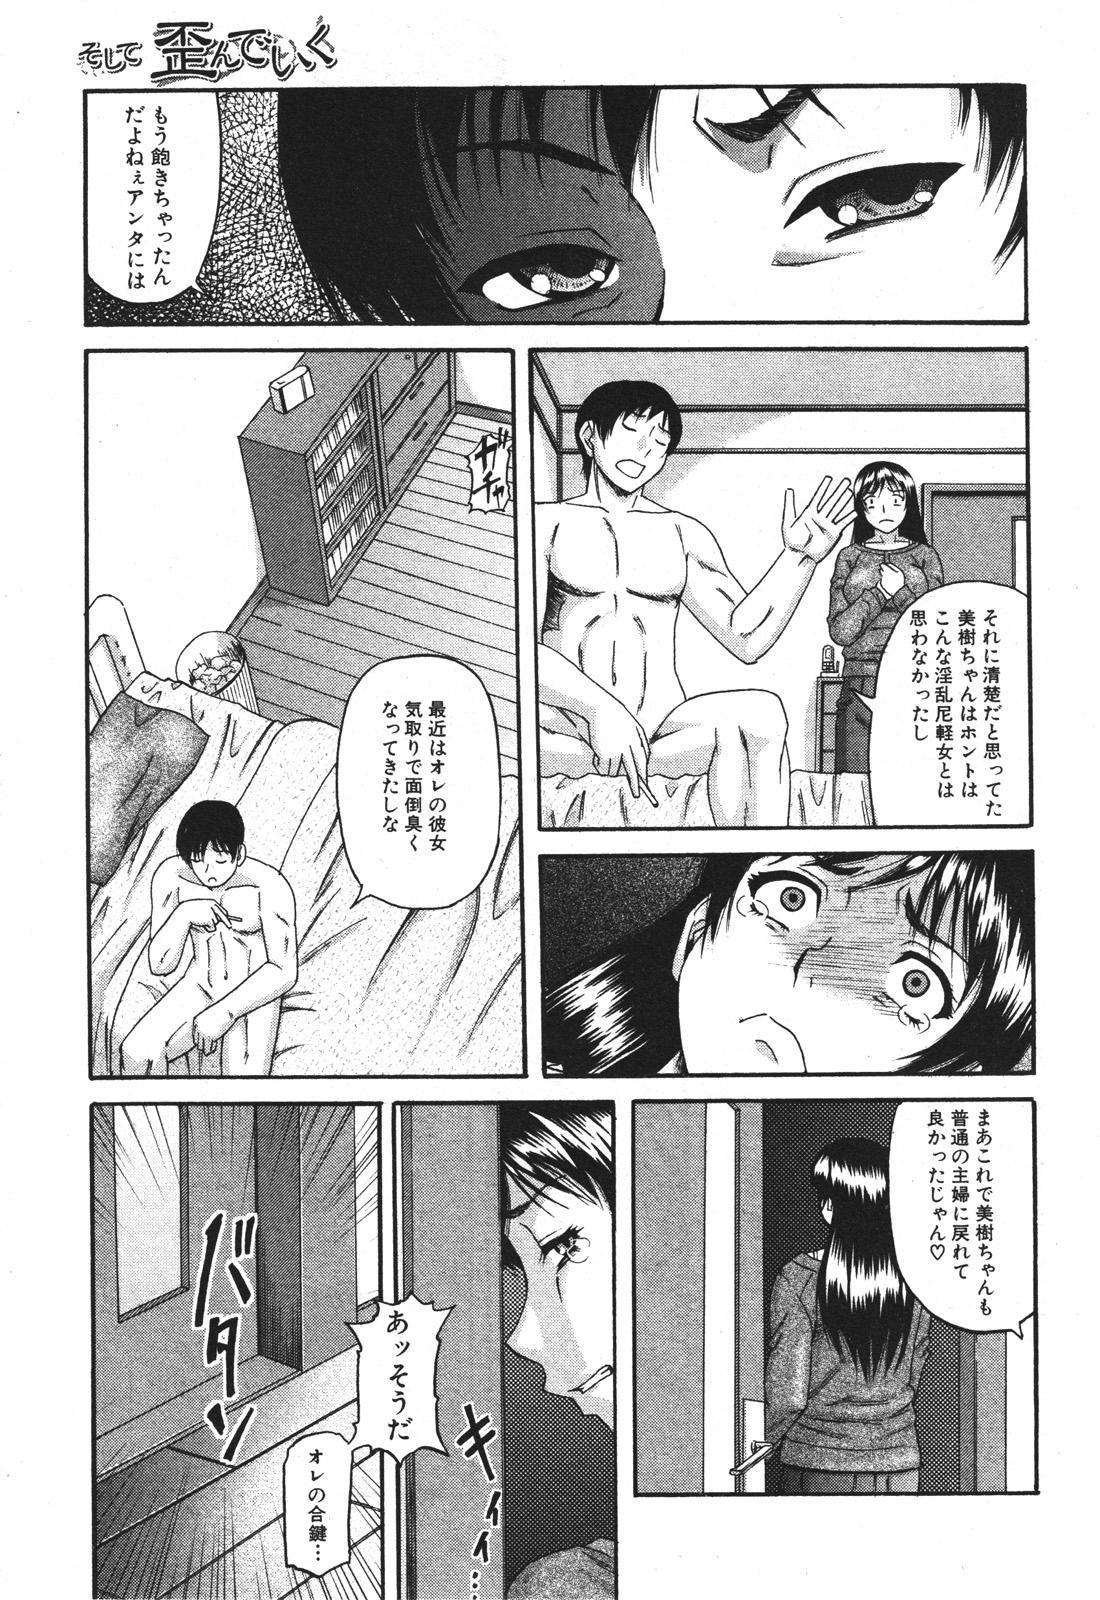 BUSTER COMIC 2010-05 Vol.07 115